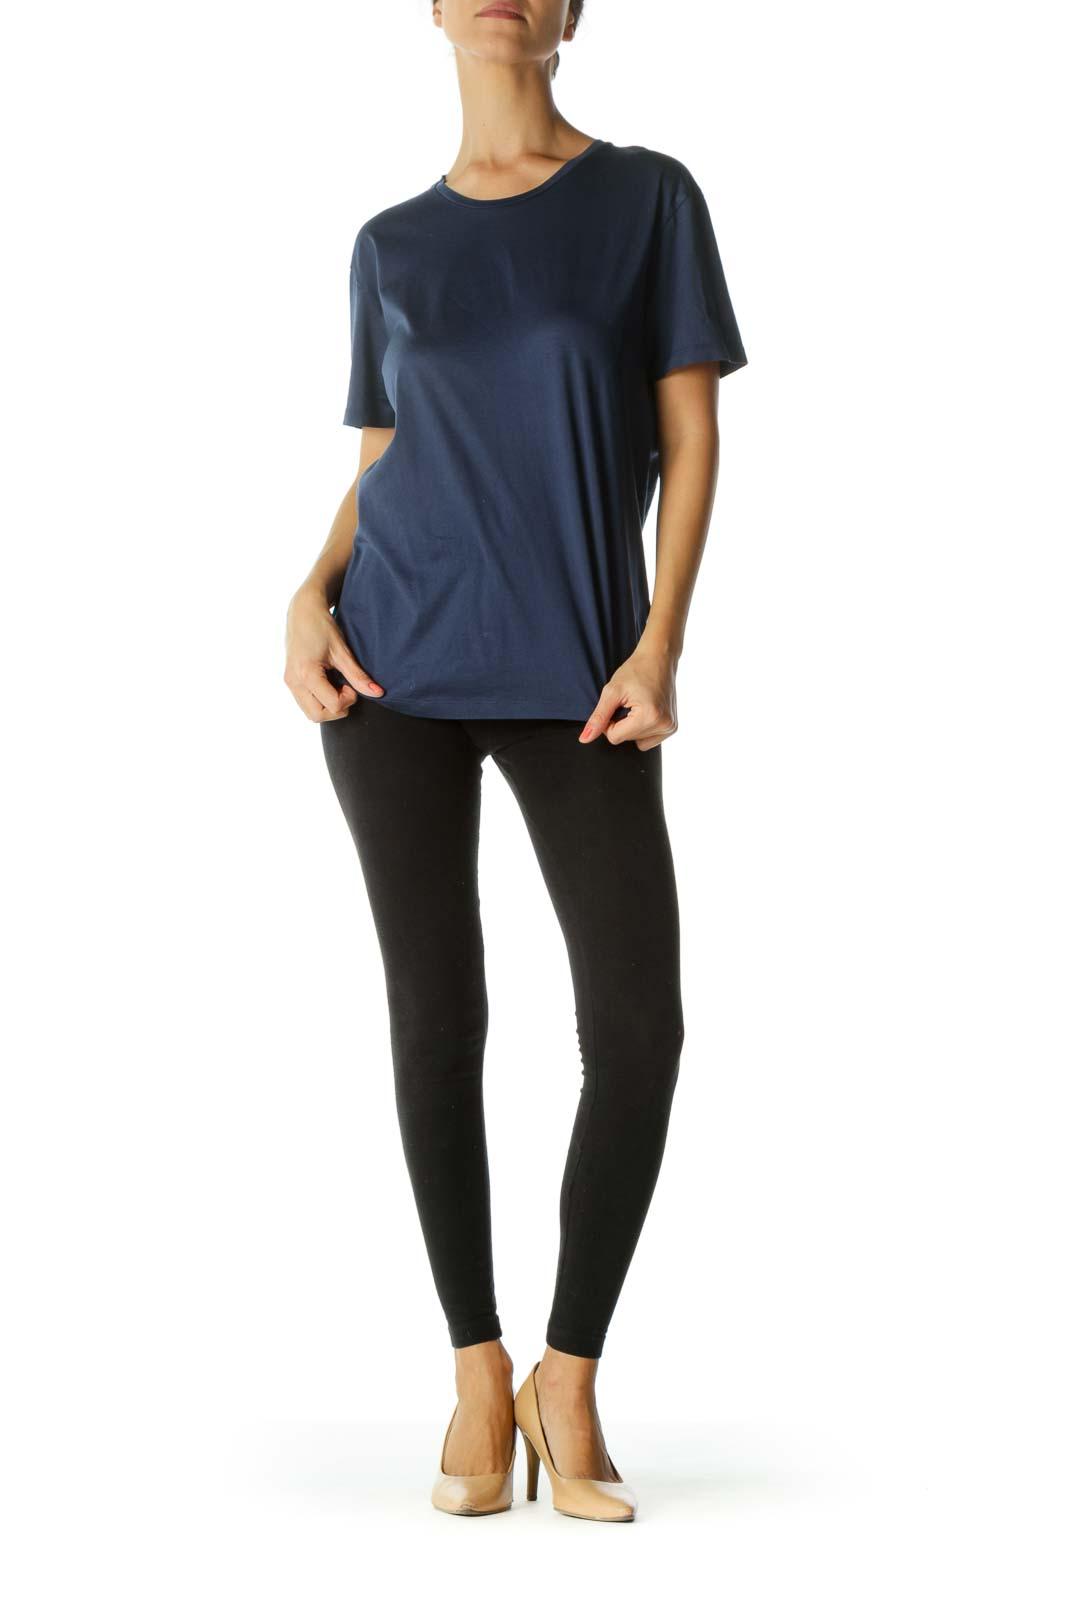 Blue 100% Cotton Round Neck Shiny T-Shirt